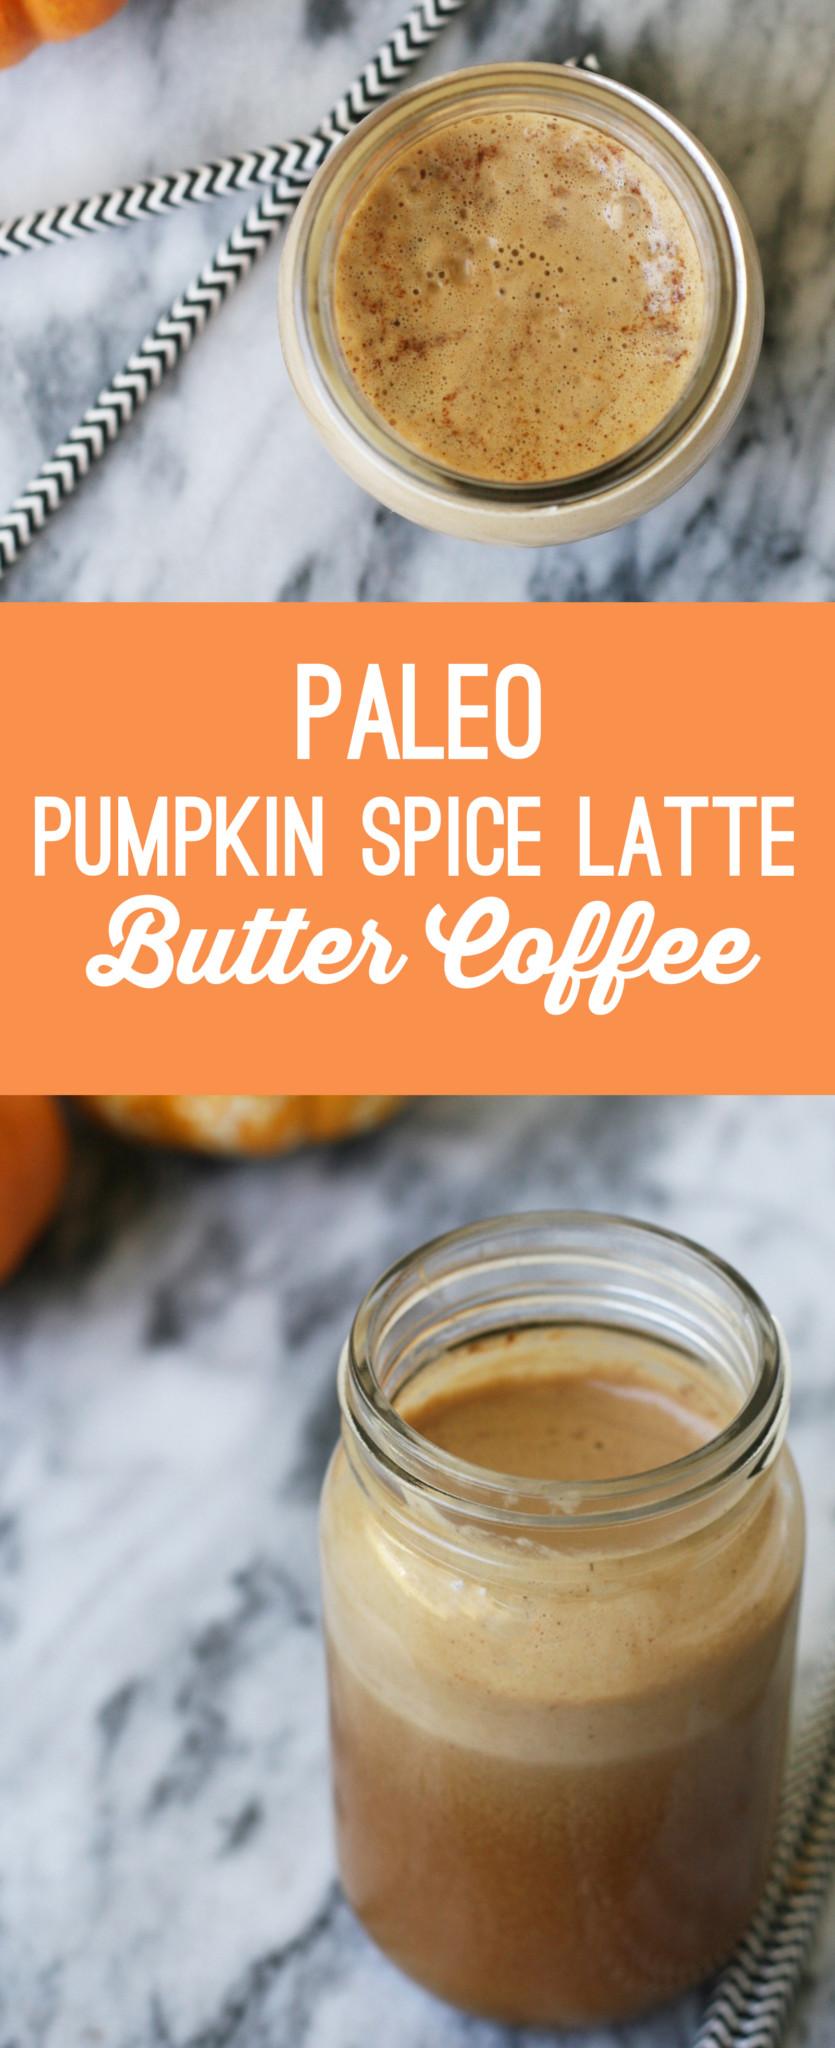 Paleo Pumpkin Spice Latte Butter Coffee